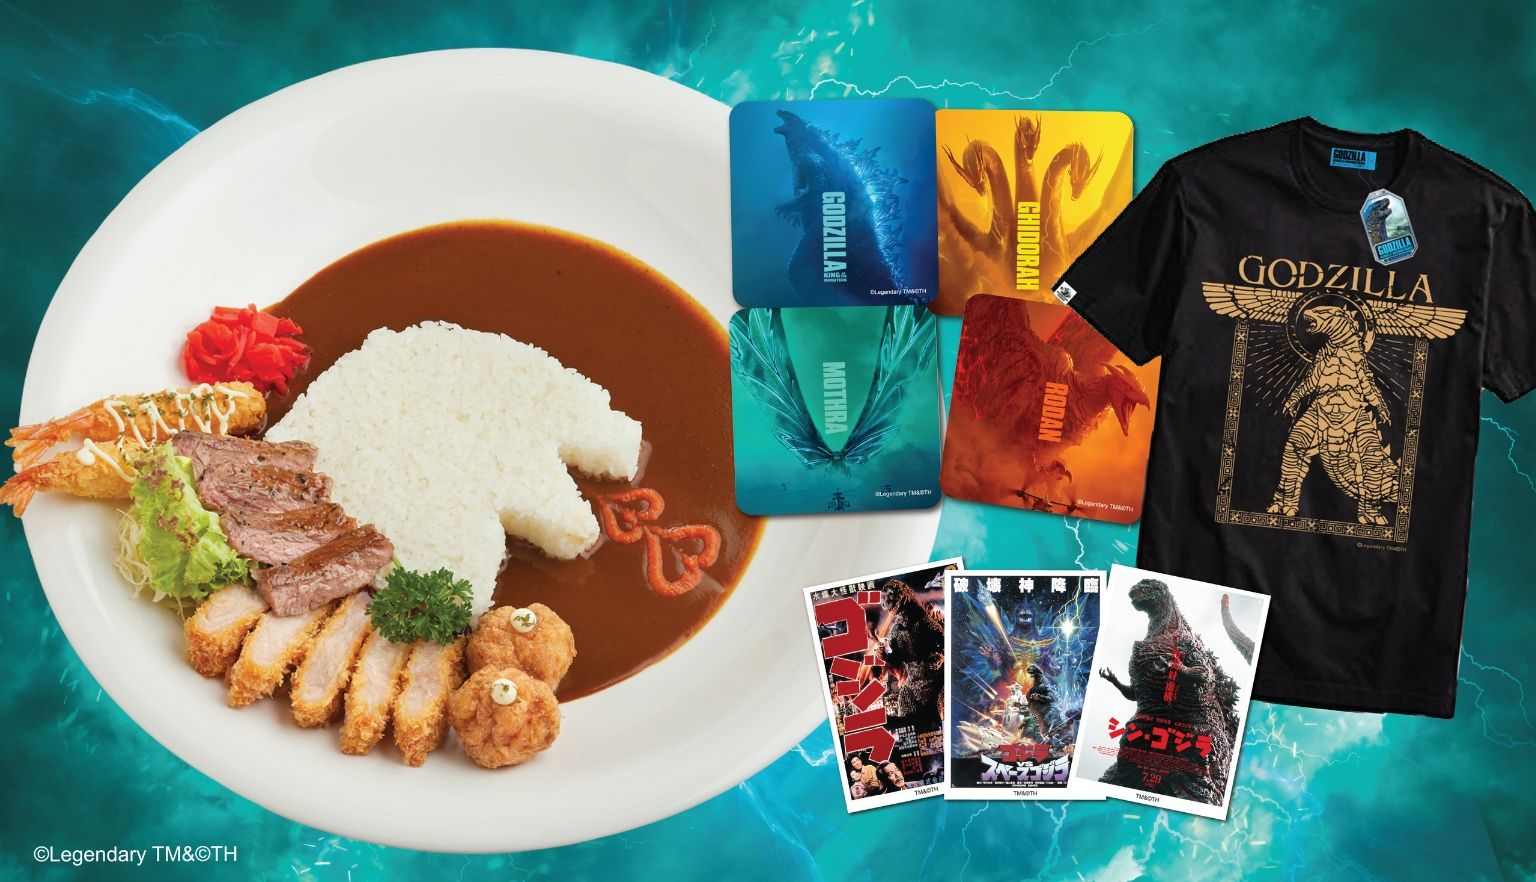 wholesale dealer 6619e 7c3cb Godzilla menu and merchandise at Monster Curry - Suntec City